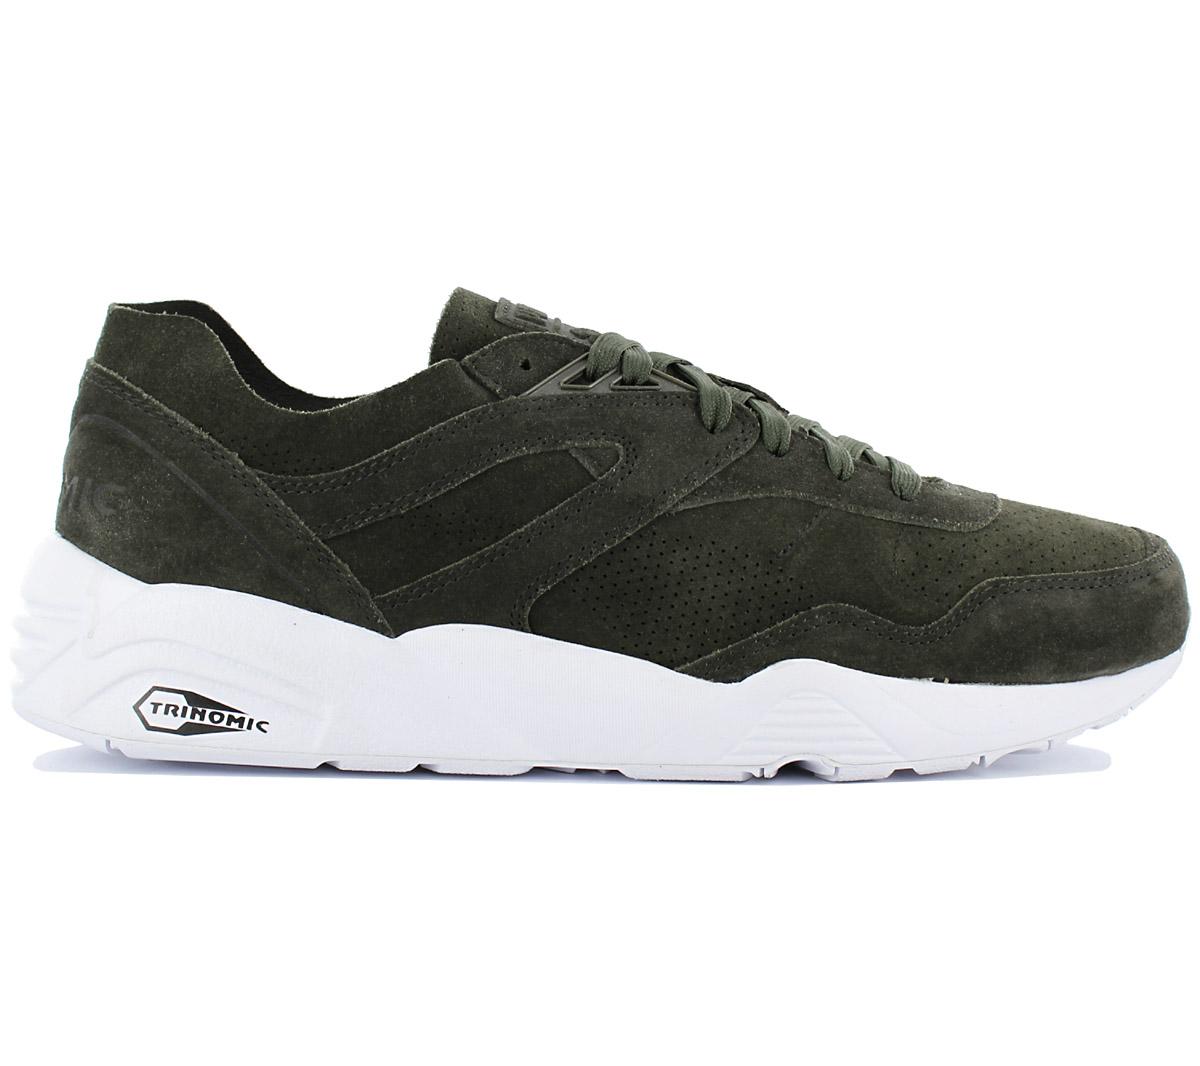 puma r698 trainers